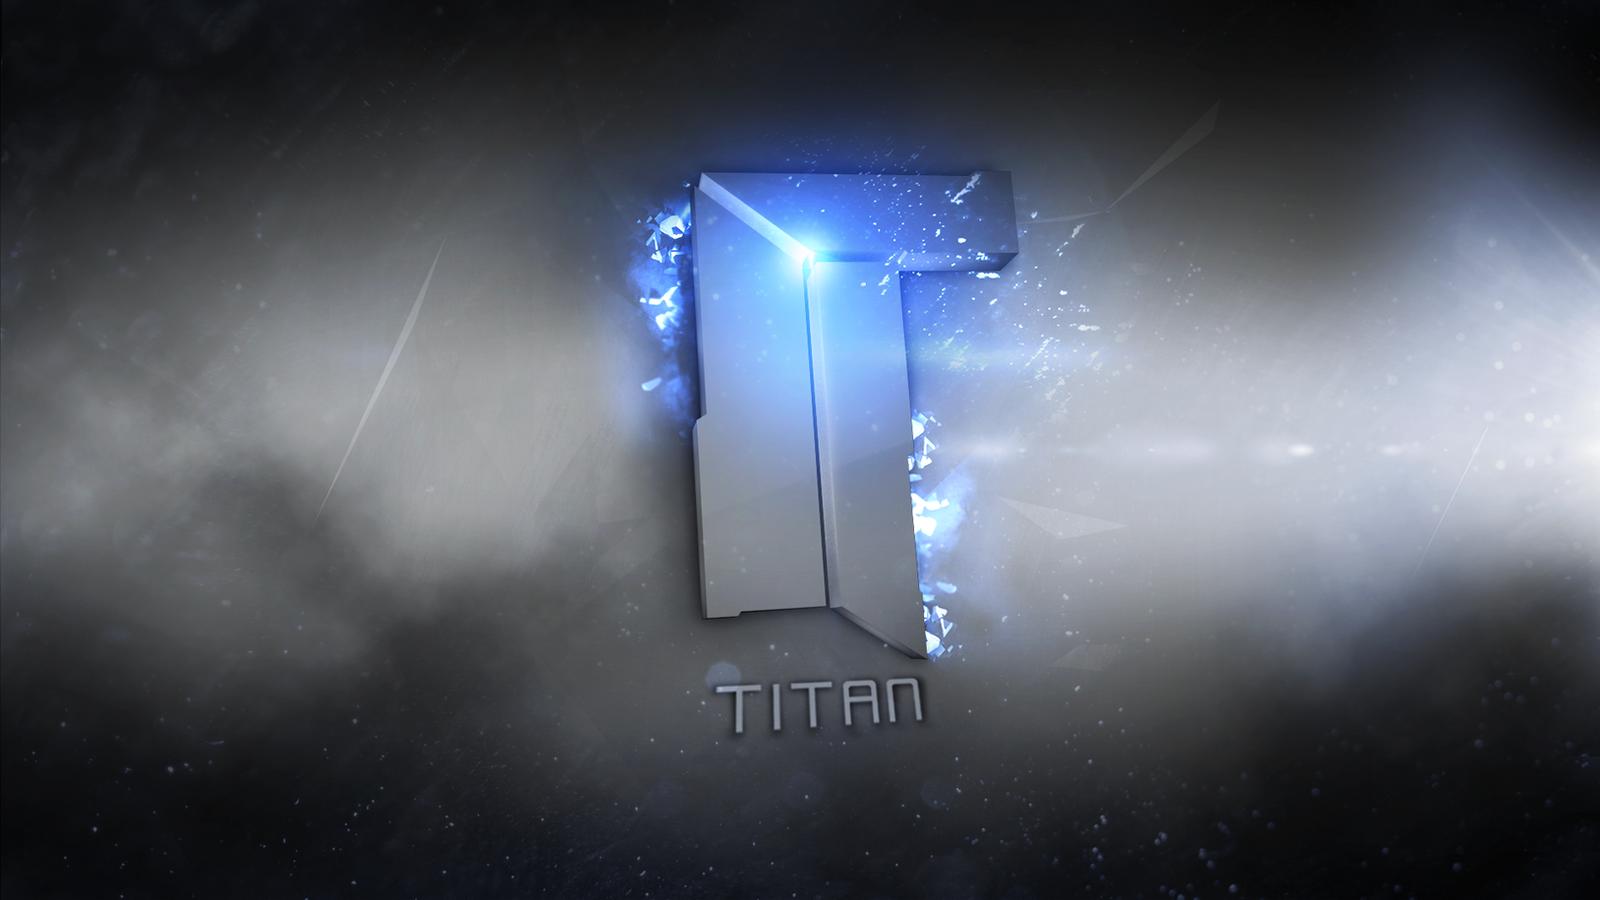 Titan Wallpaper By KayEE3n